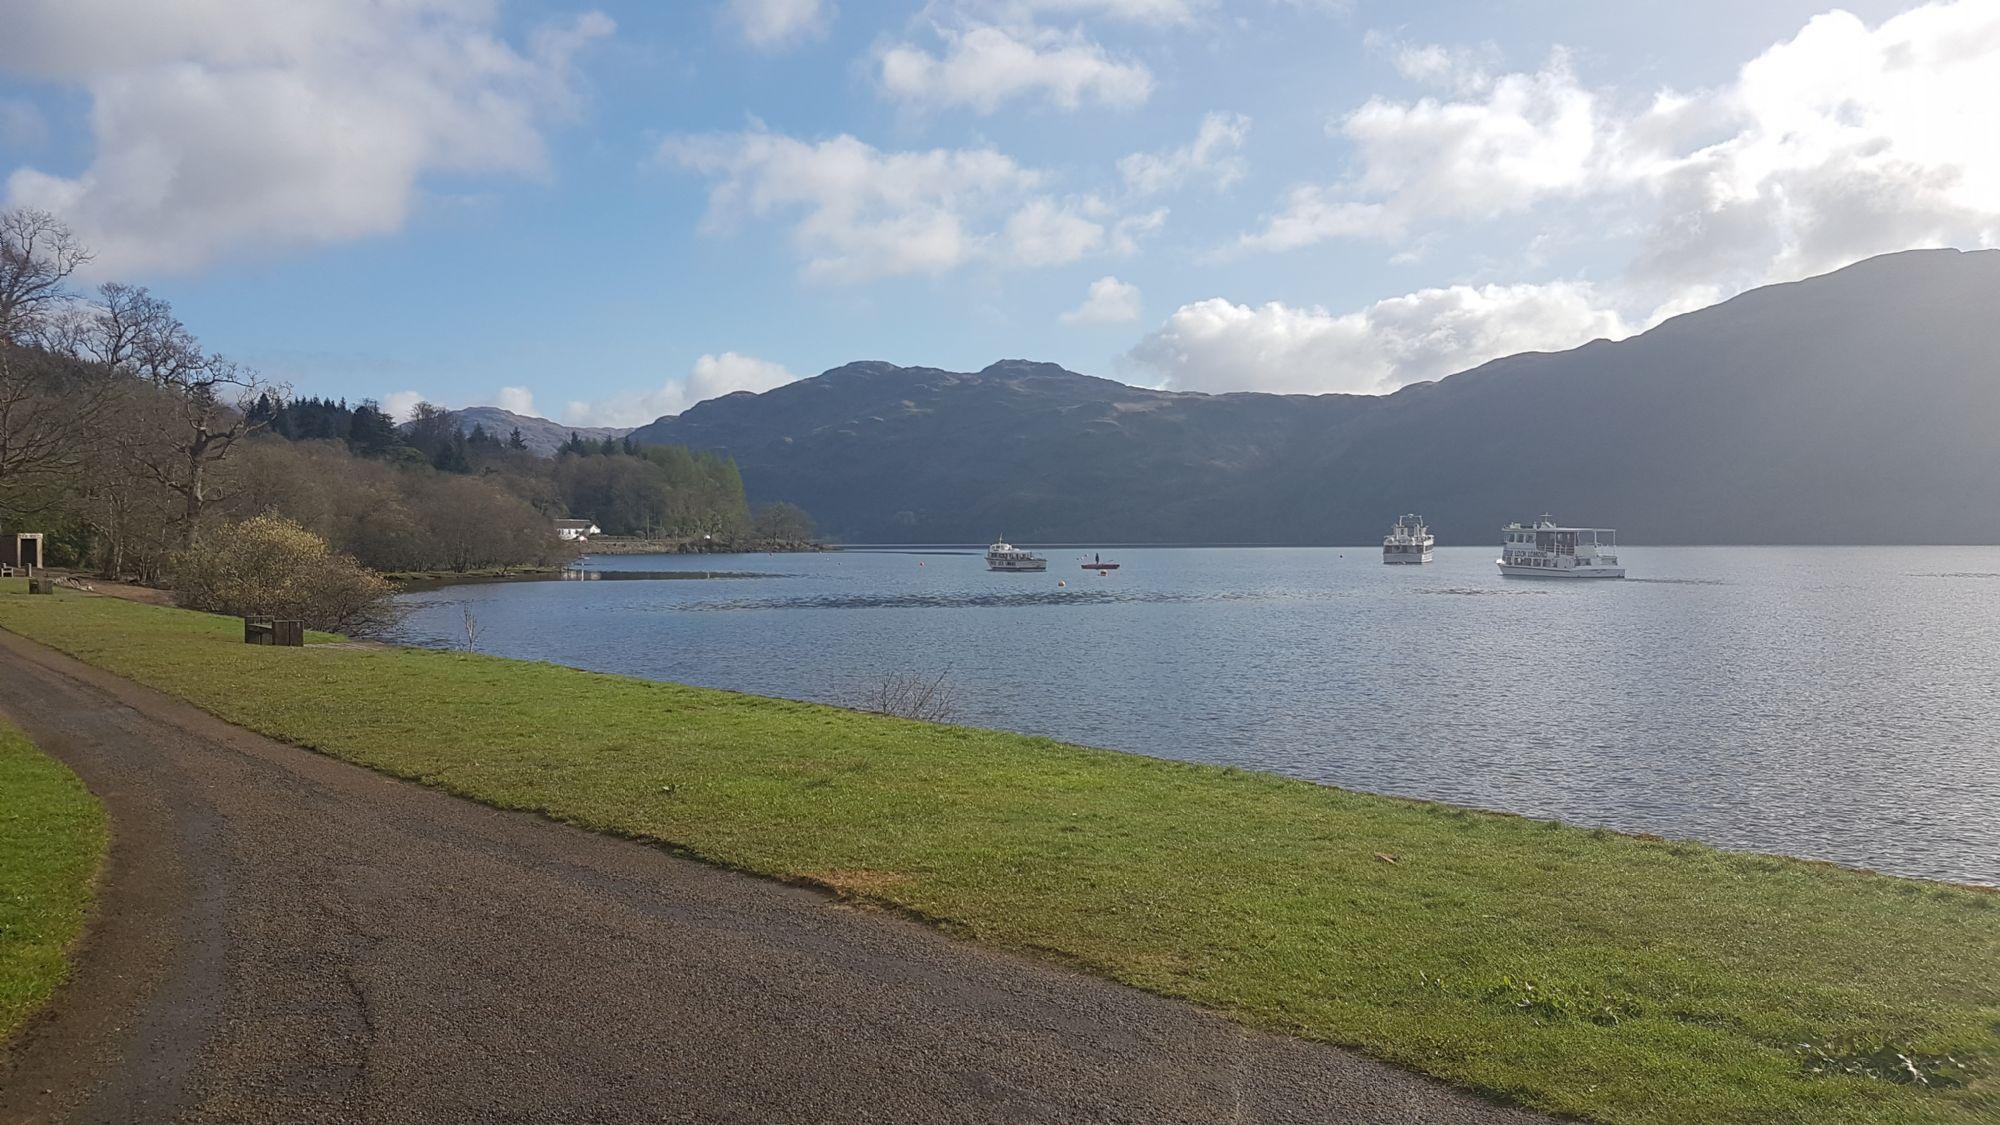 The road to Loch Lomond